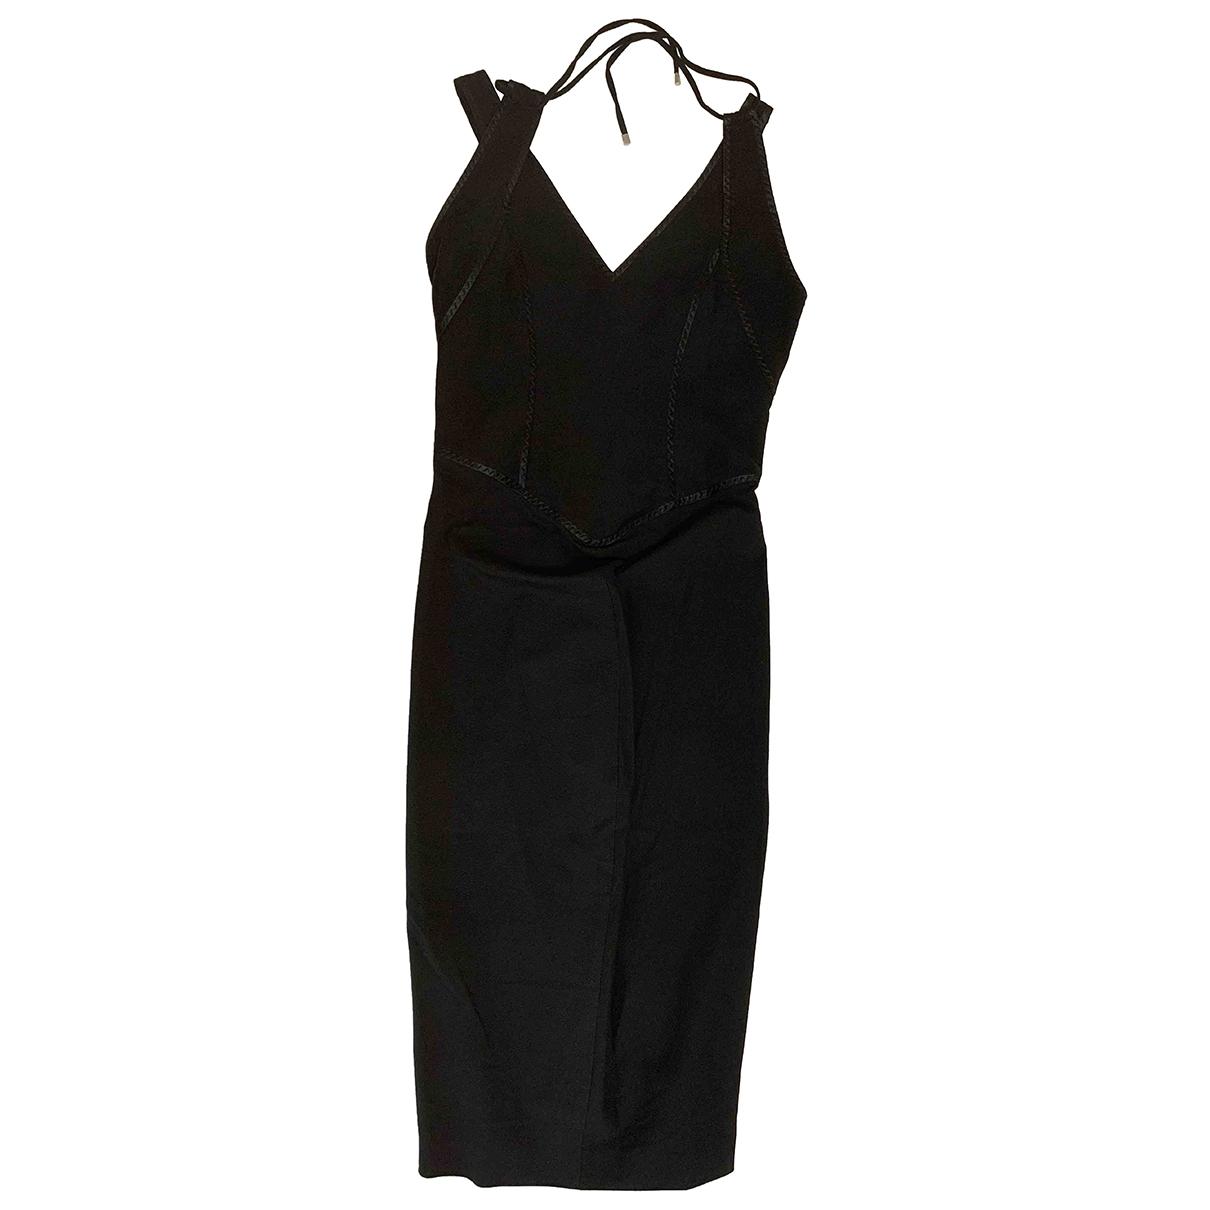 Sport Max \N Black Cotton dress for Women 40 IT